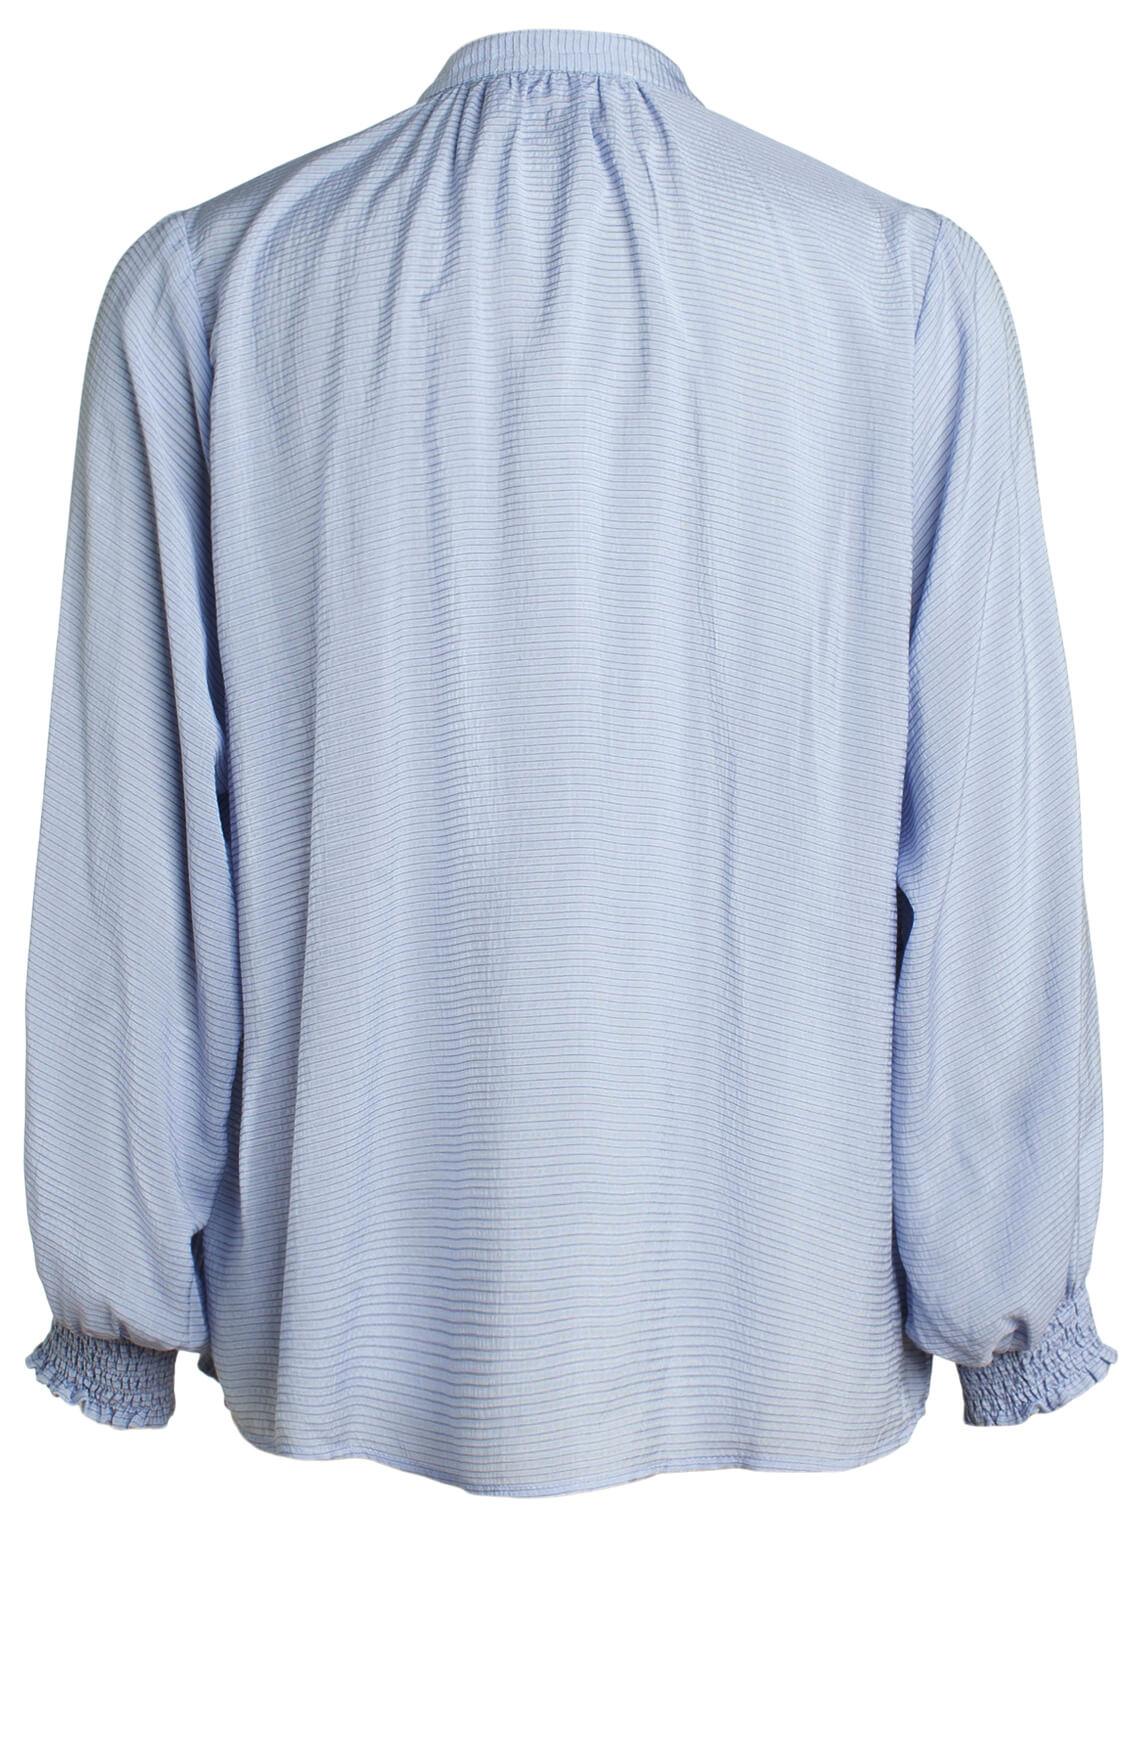 Co Couture Dames Pauline blouse Blauw